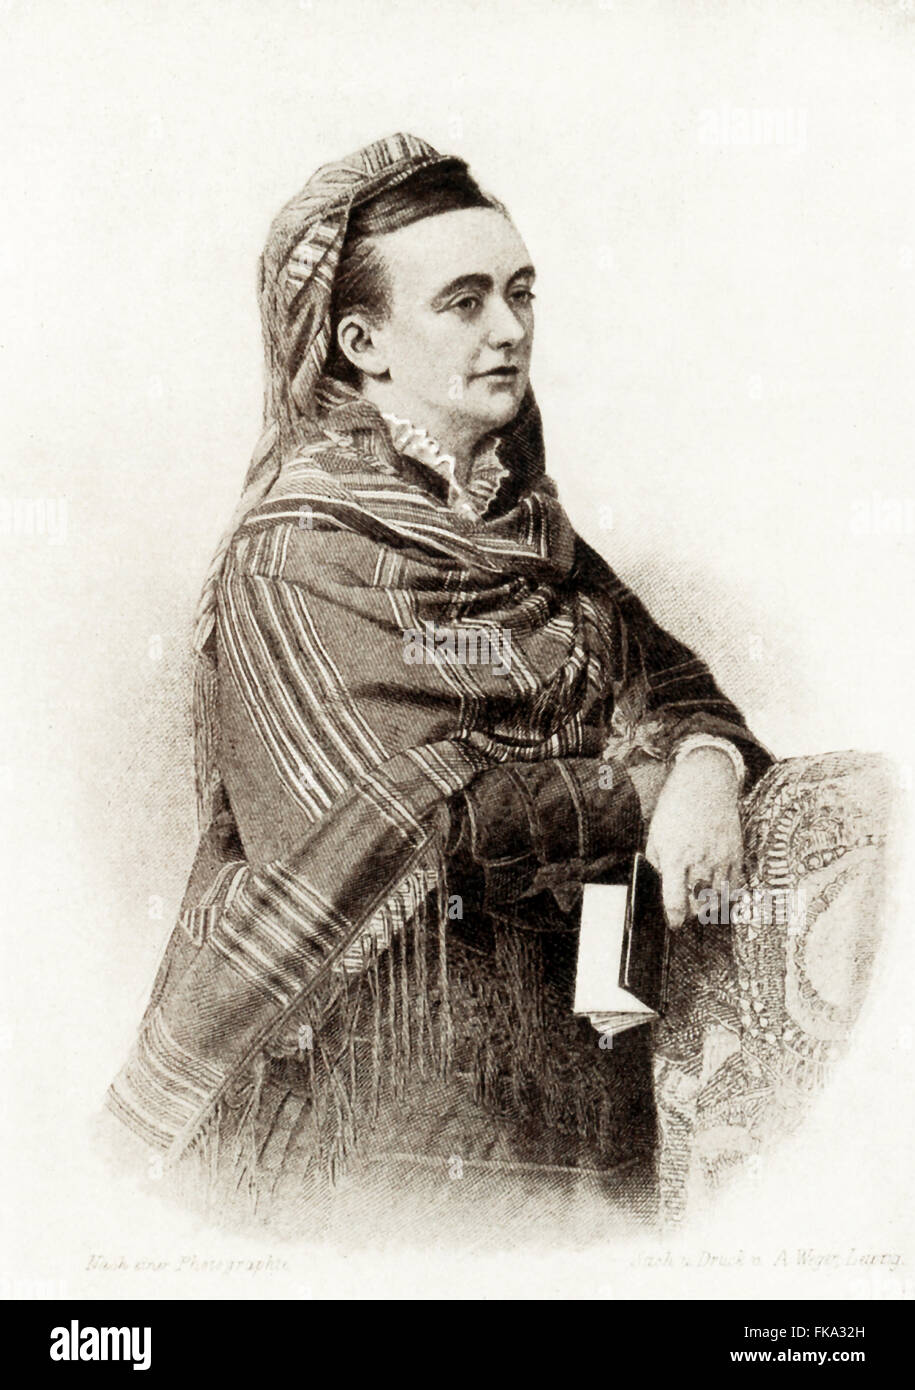 Amelia Blanford Edwards (1831-1892) was an English novelist, journalist, traveler, and Egyptologist. Among her successful - Stock Image